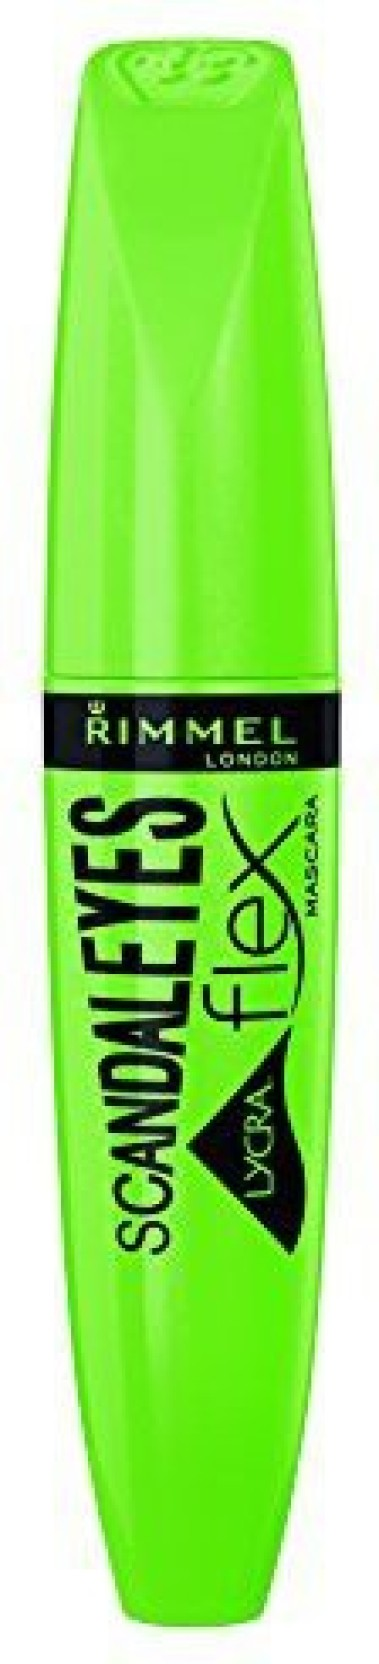 bbff52634e5 Rimmel London Scandals Lycra Flex Mascara Black 001 Black 12 ml. ON OFFER